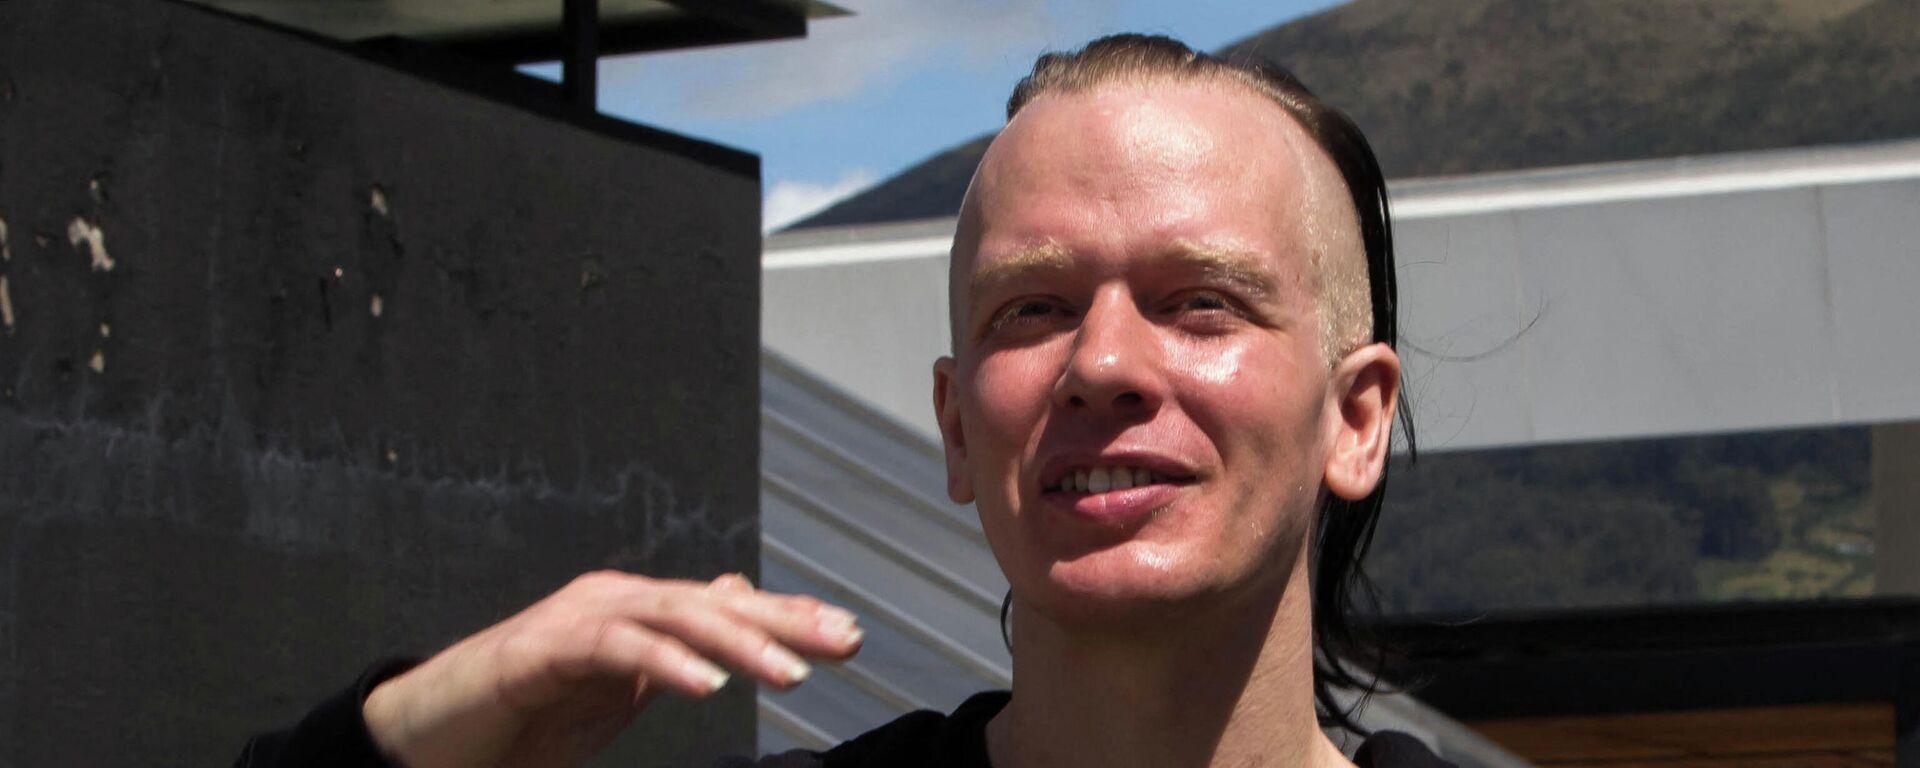 Ola Bini , desarrollador de software sueco  - Sputnik Mundo, 1920, 08.09.2021